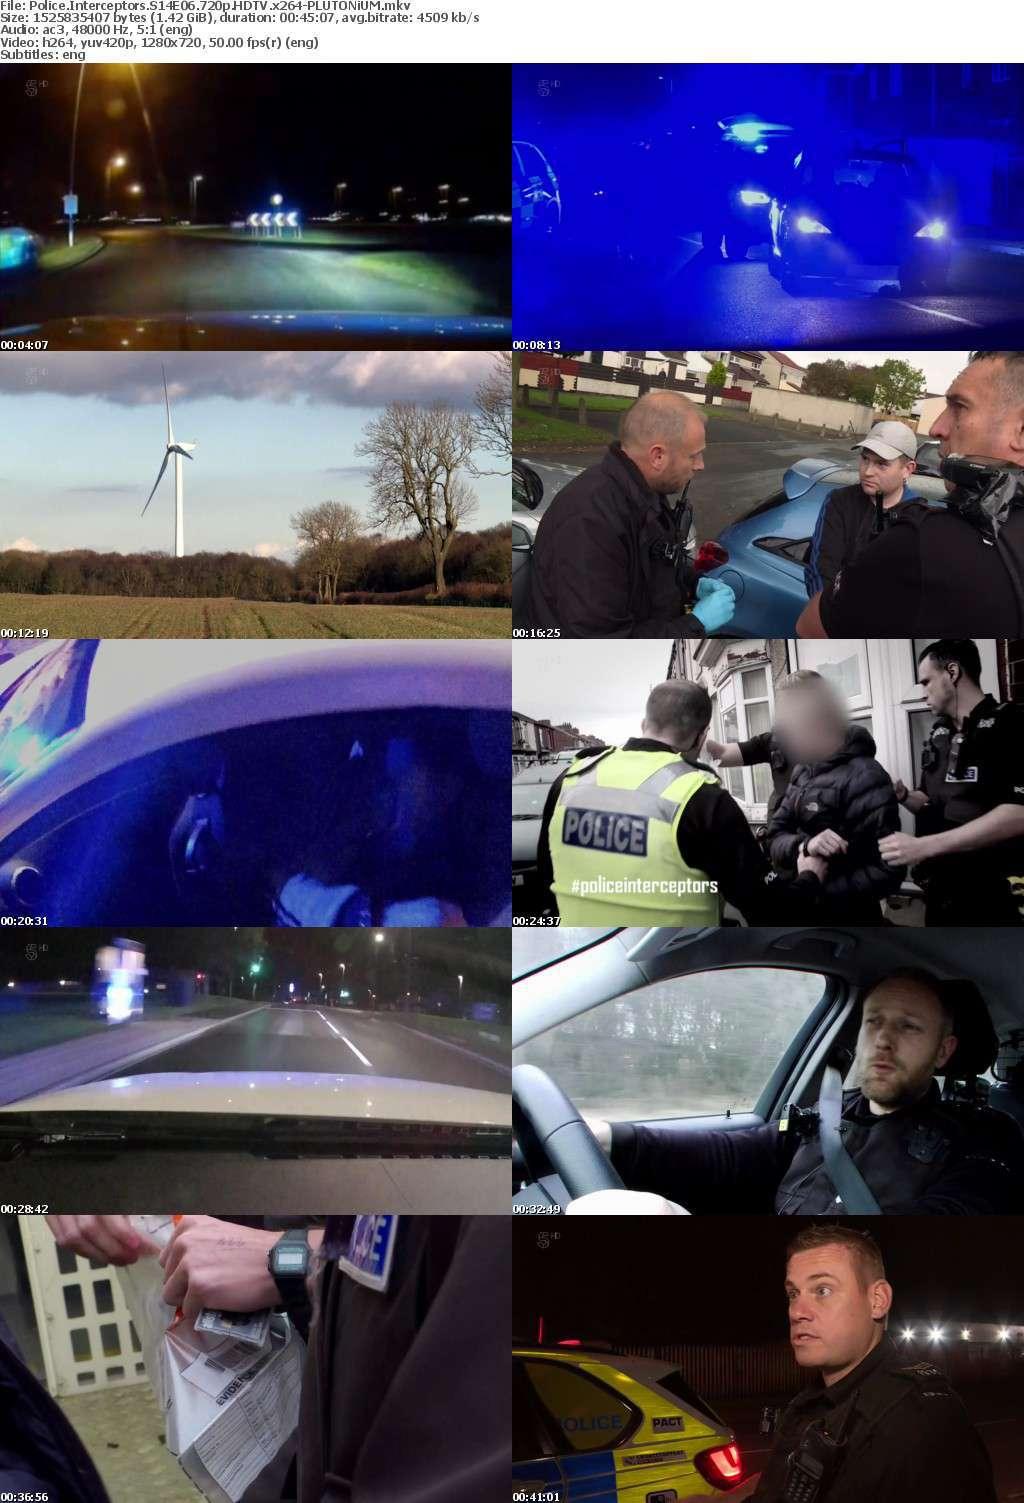 Police Interceptors S14E06 720p HDTV x264-PLUTONiUM